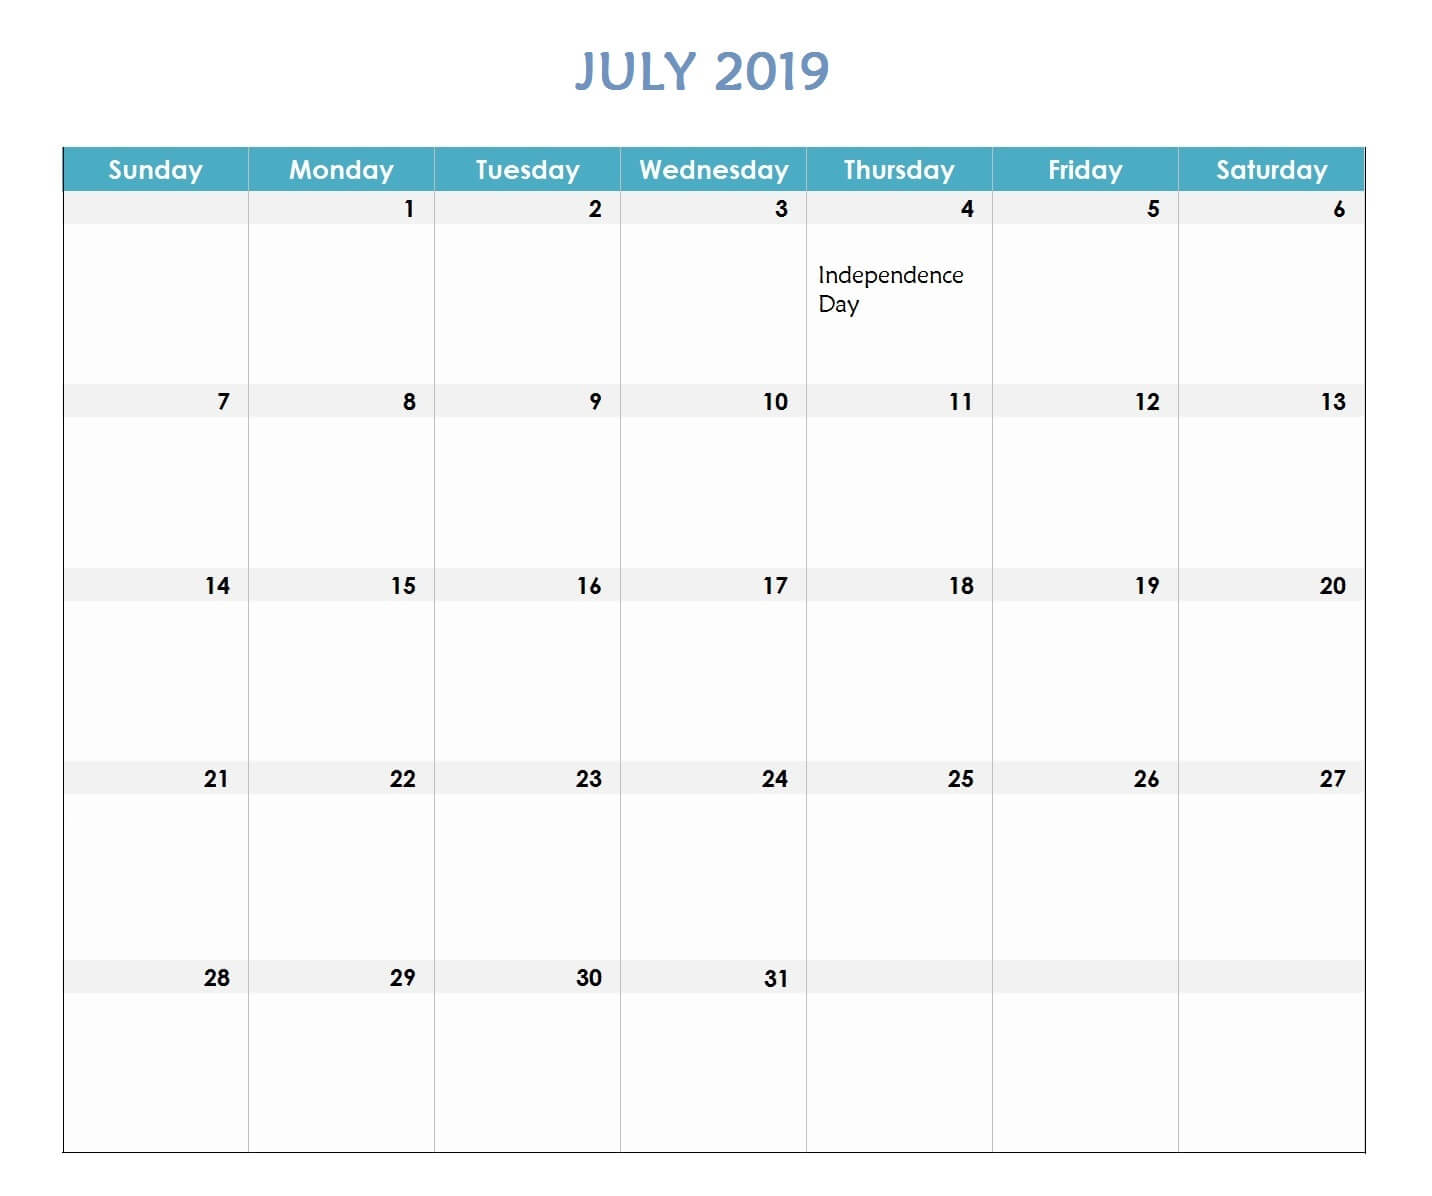 July 2019 Excel Calendar